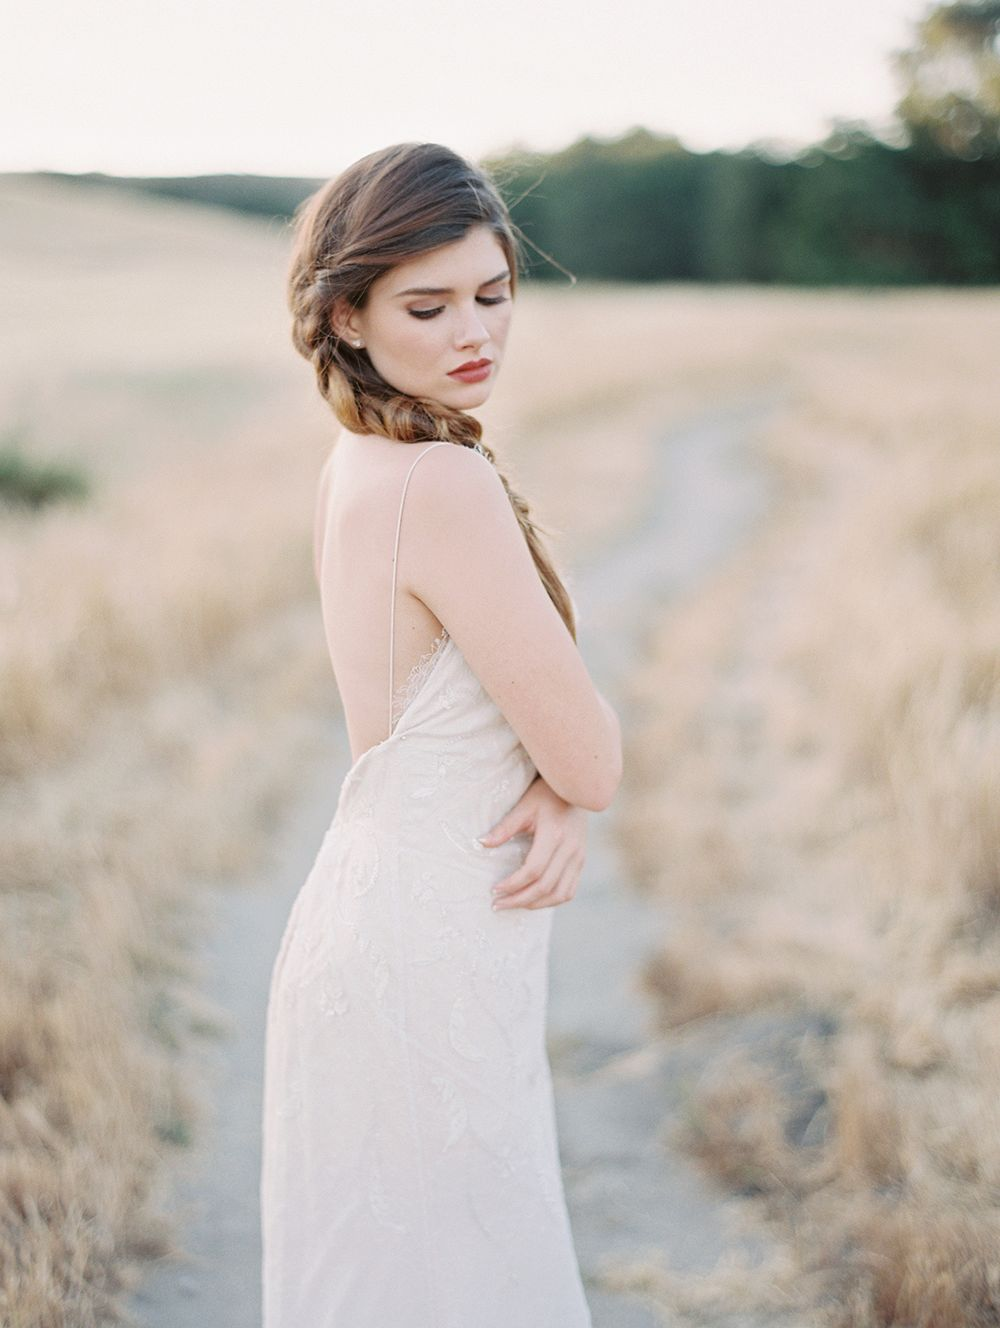 Braided Hair for a Spring Bride by Valentina Glidden   Wedding Sparrow